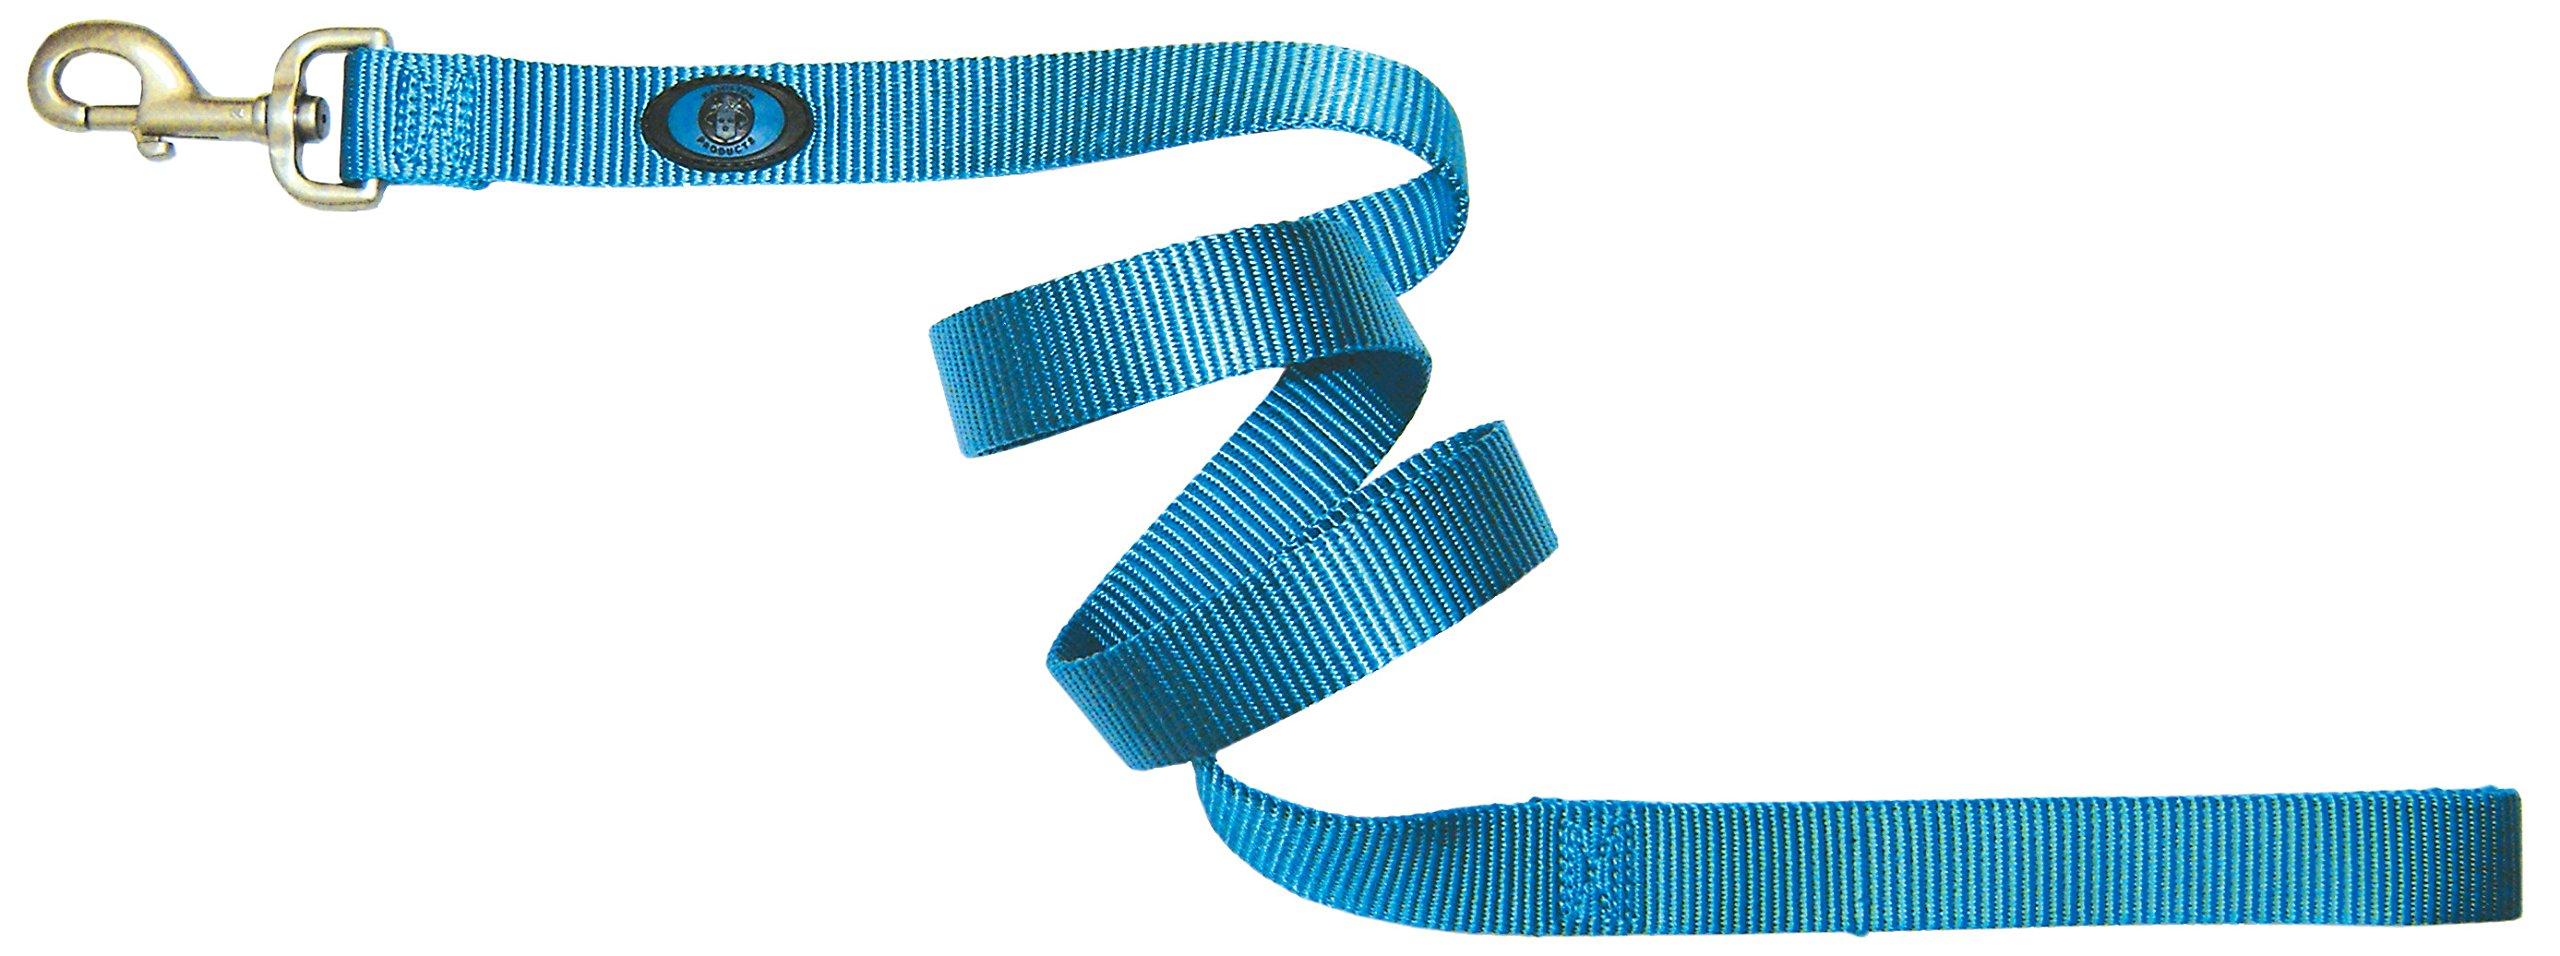 Hamilton 1-Inch Single Thick Nylon Lead with Swivel Snap Brushed Hardware, 6-Feet/Long, Ocean Blue